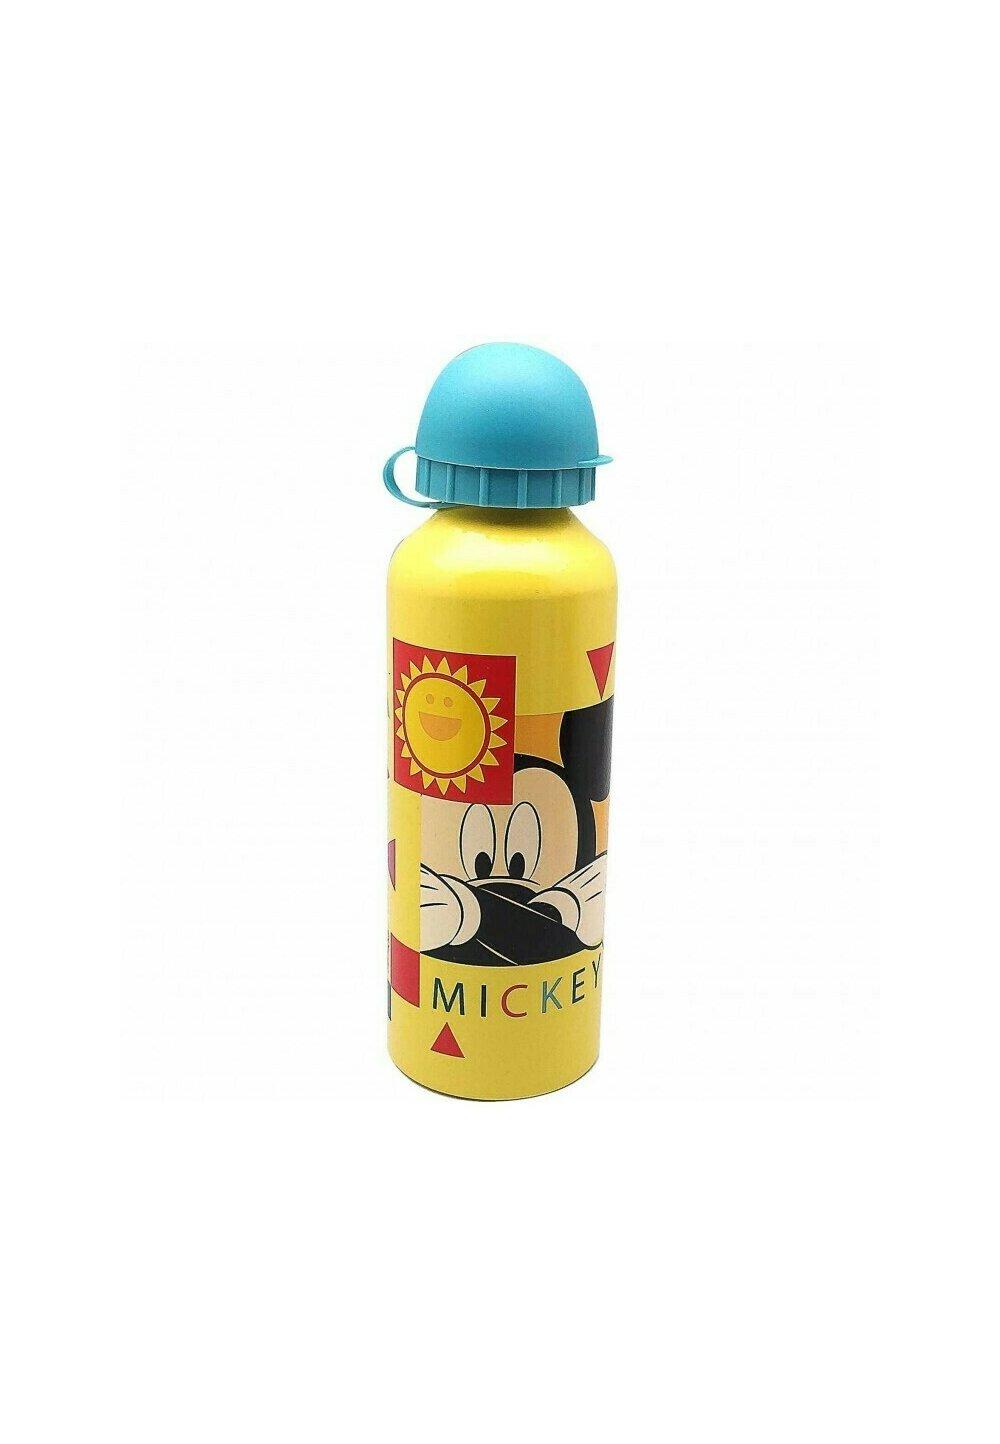 Sticla de aluminiu, Hey Mickey, galbena cu capac turcoaz imagine